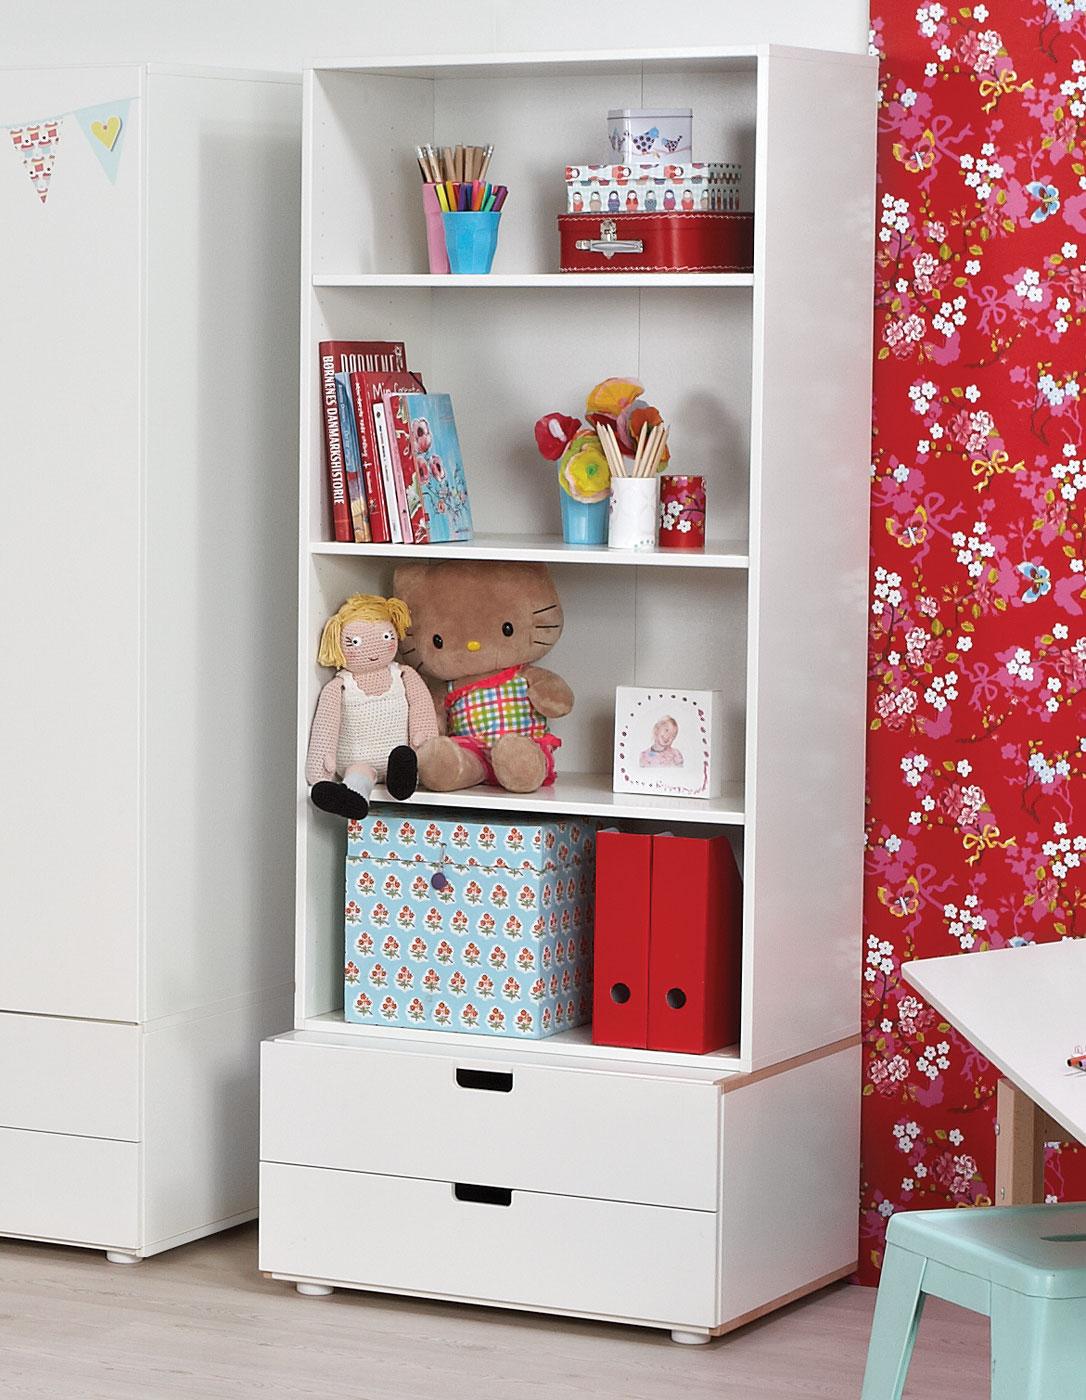 regale kinderzimmer hausgestaltung ideen. Black Bedroom Furniture Sets. Home Design Ideas